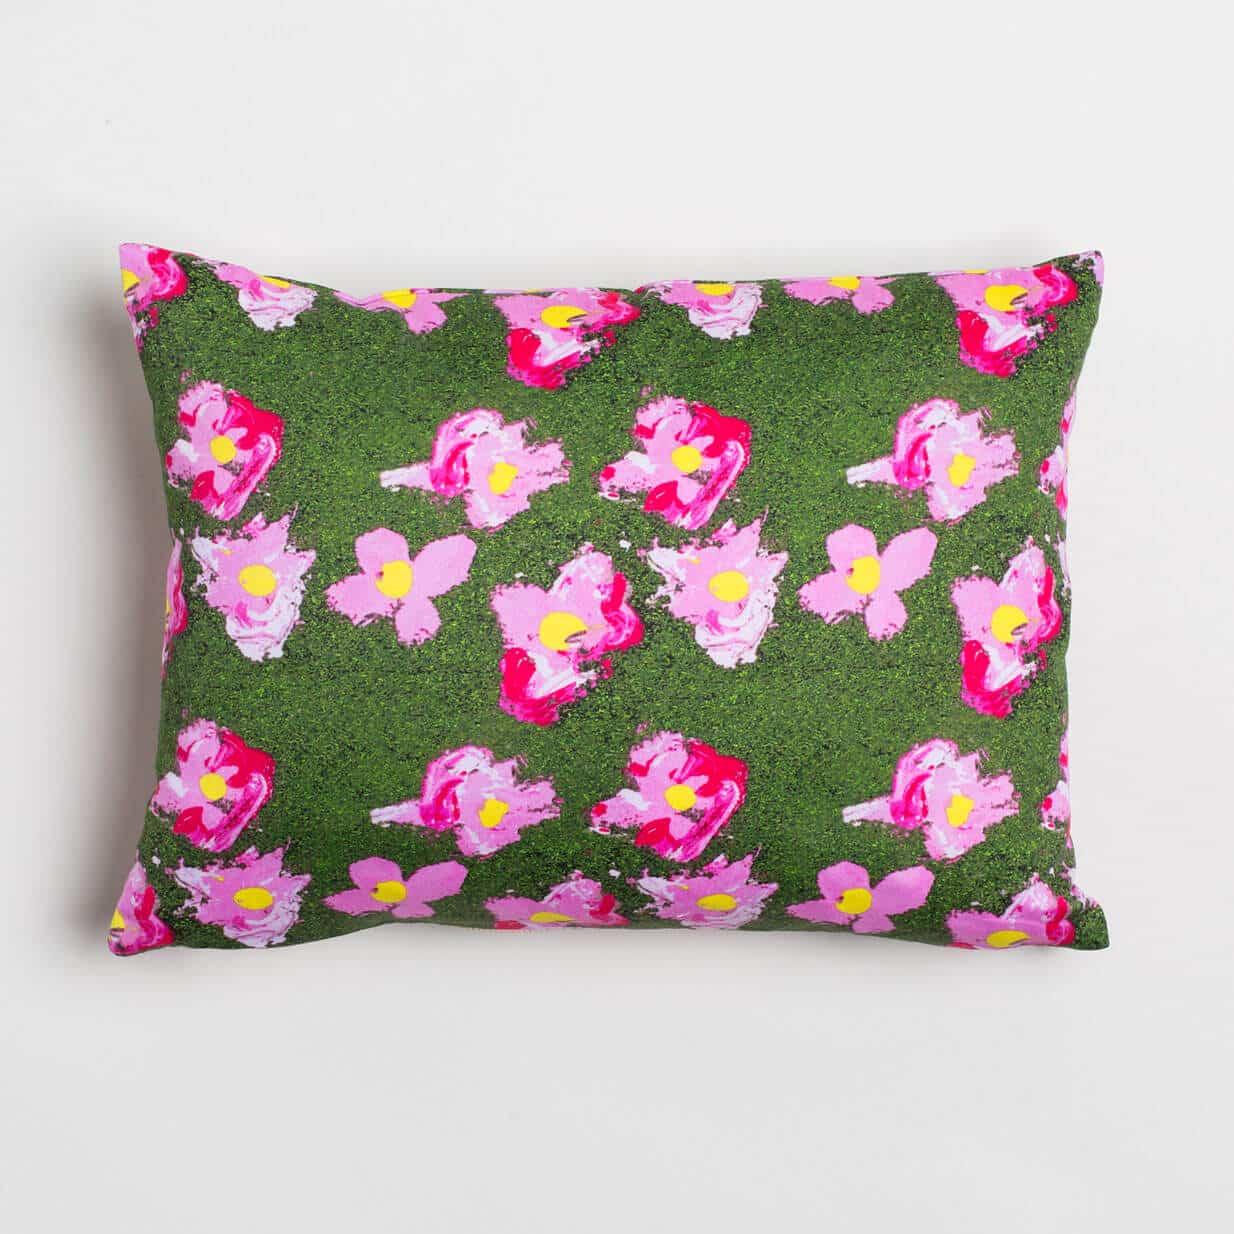 Luxury organic pink and green flower oblong lumber pillow